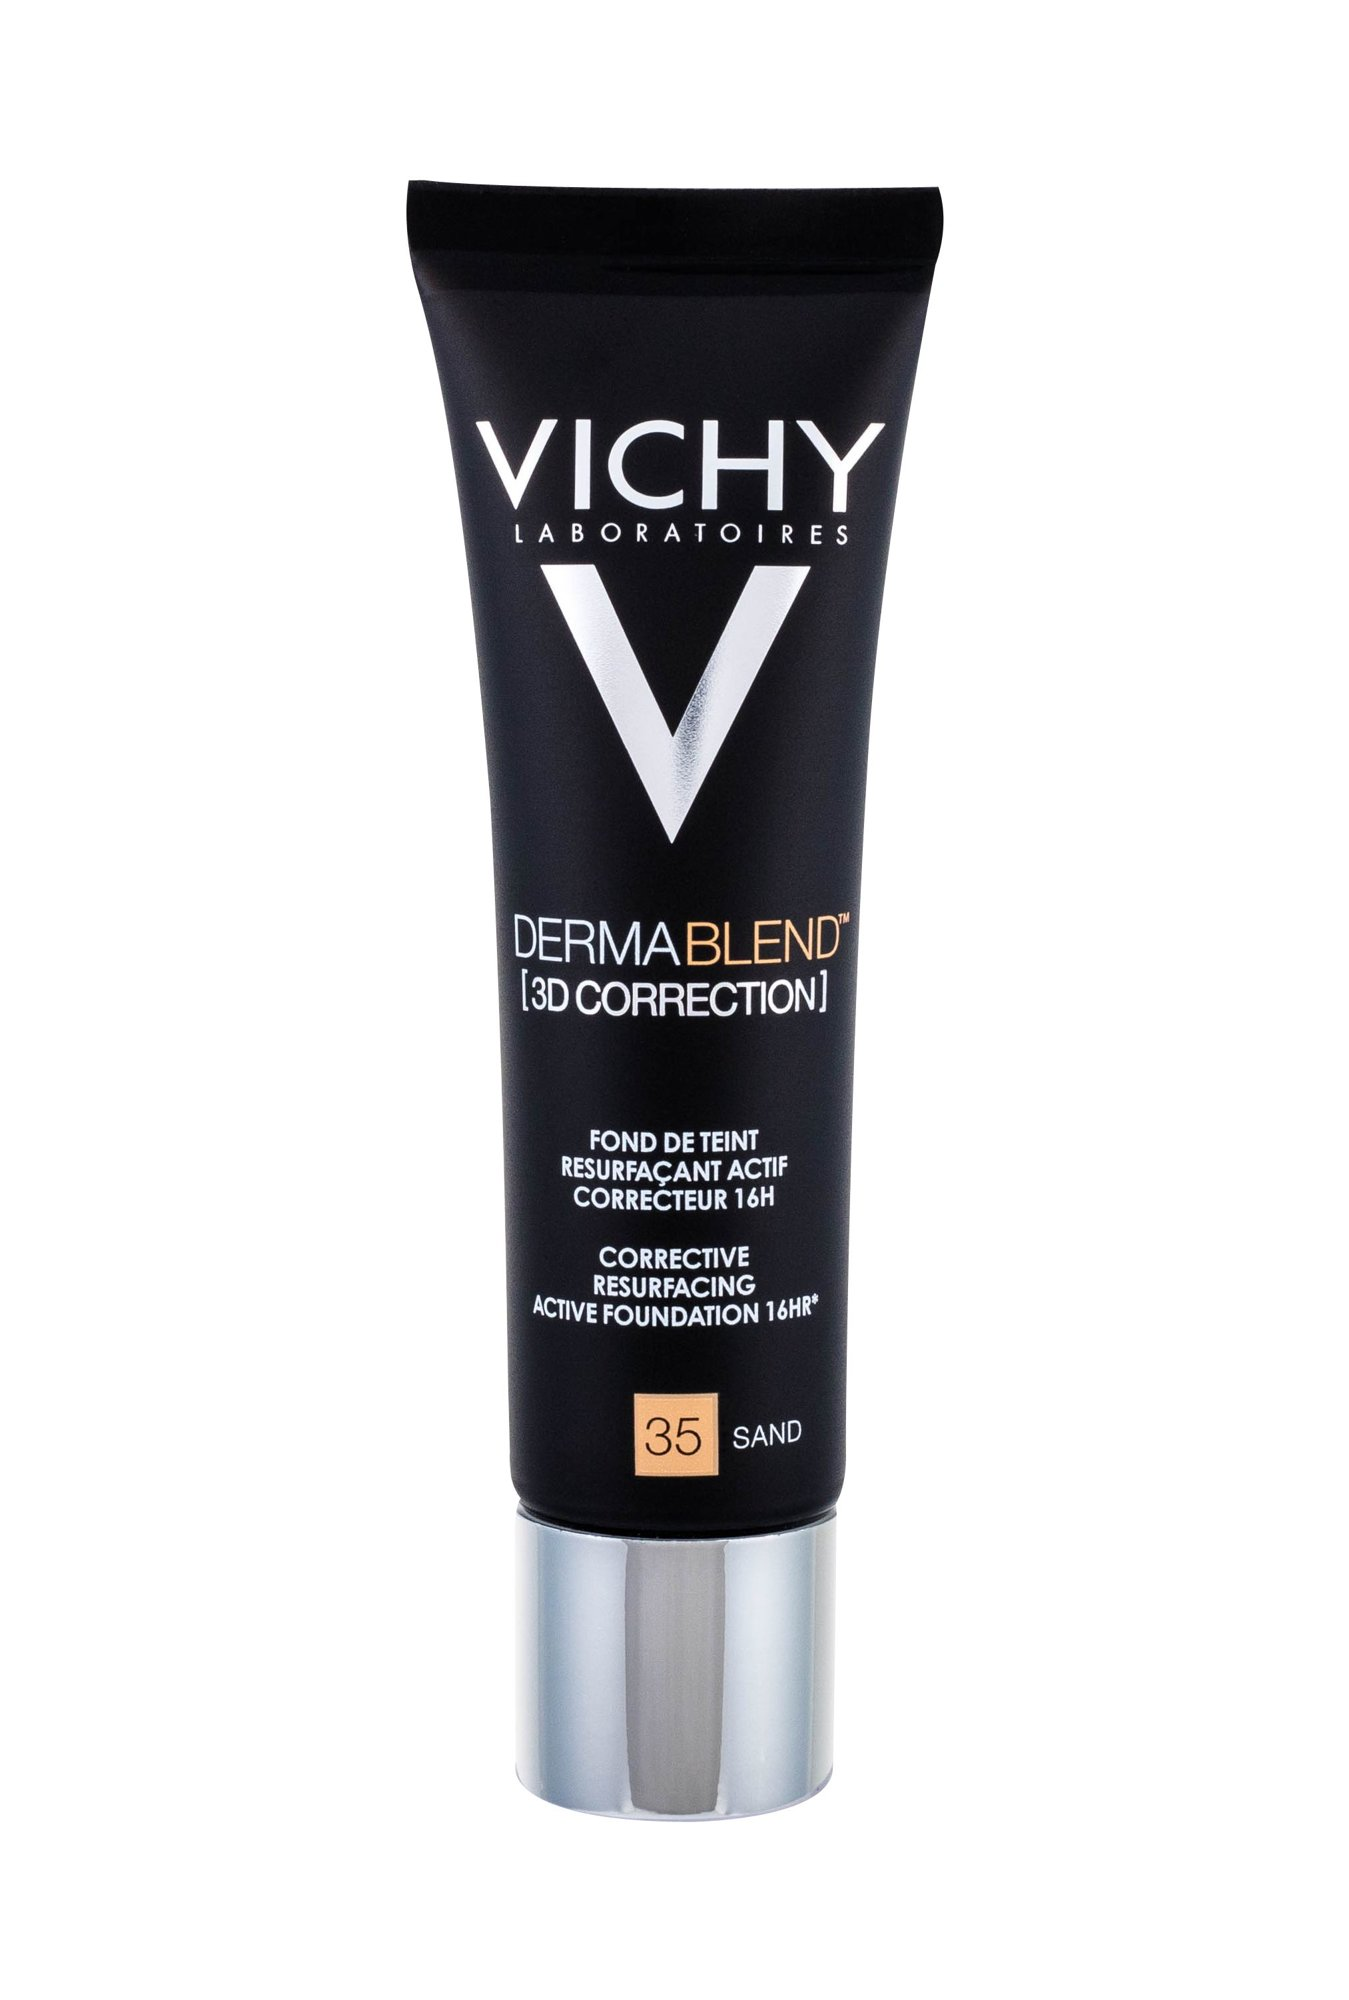 Vichy Dermablend Makeup 30ml 35 Sand